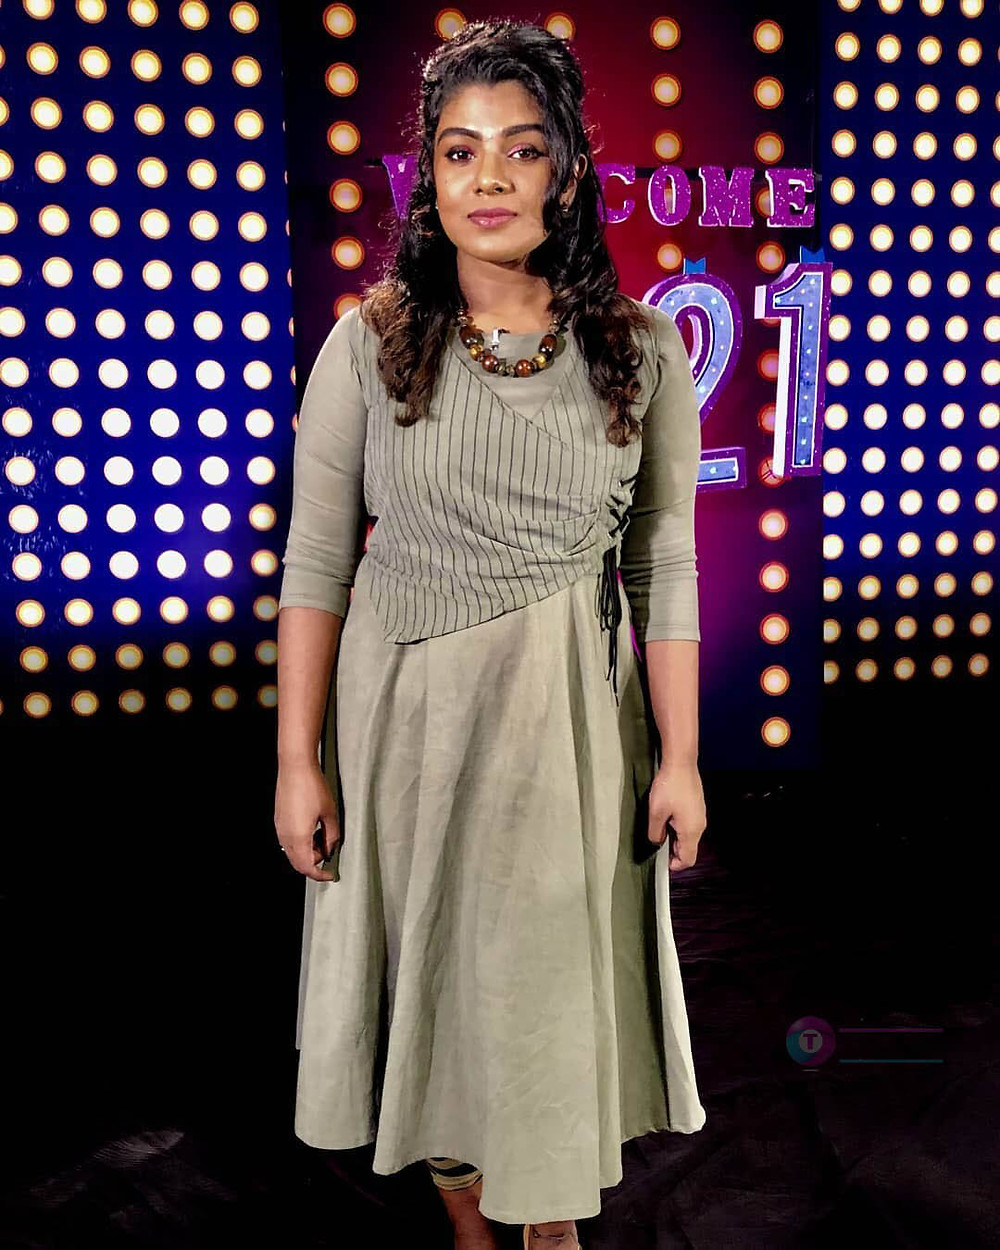 Lekshmi Jayan Star Singer